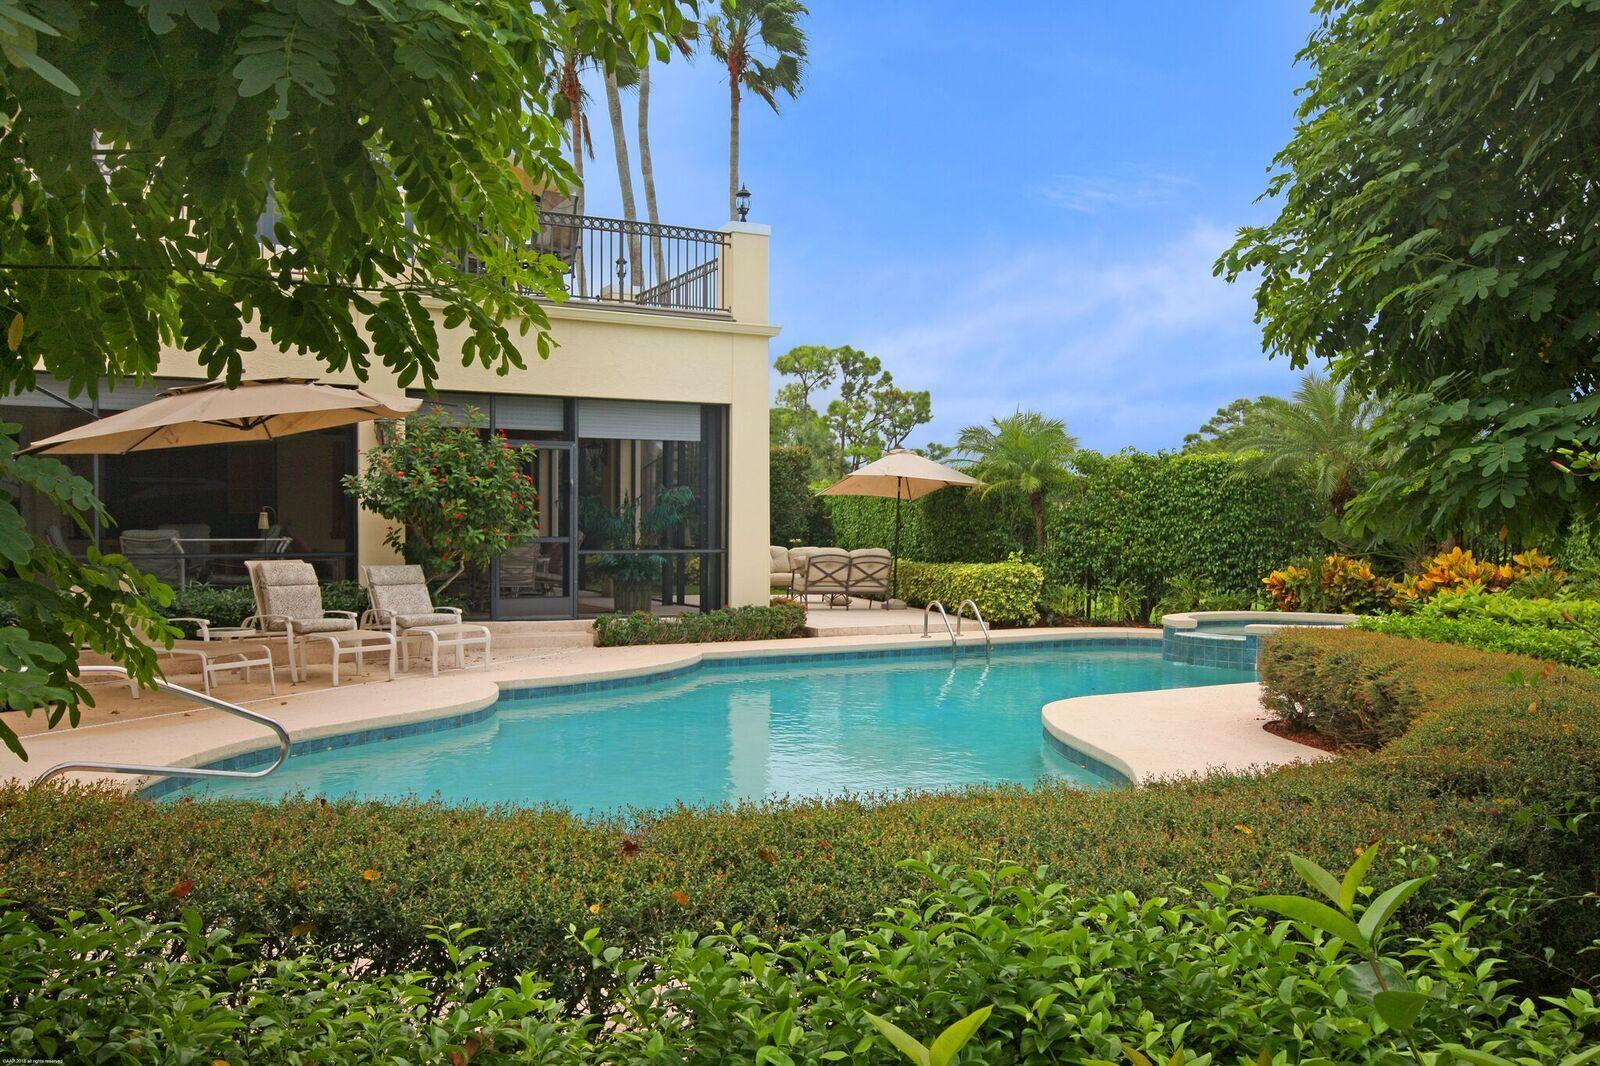 13081 Marsh Landing(s), Palm Beach Gardens, Florida 33418, 5 Bedrooms Bedrooms, ,5.1 BathroomsBathrooms,A,Single family,Marsh,RX-10473359